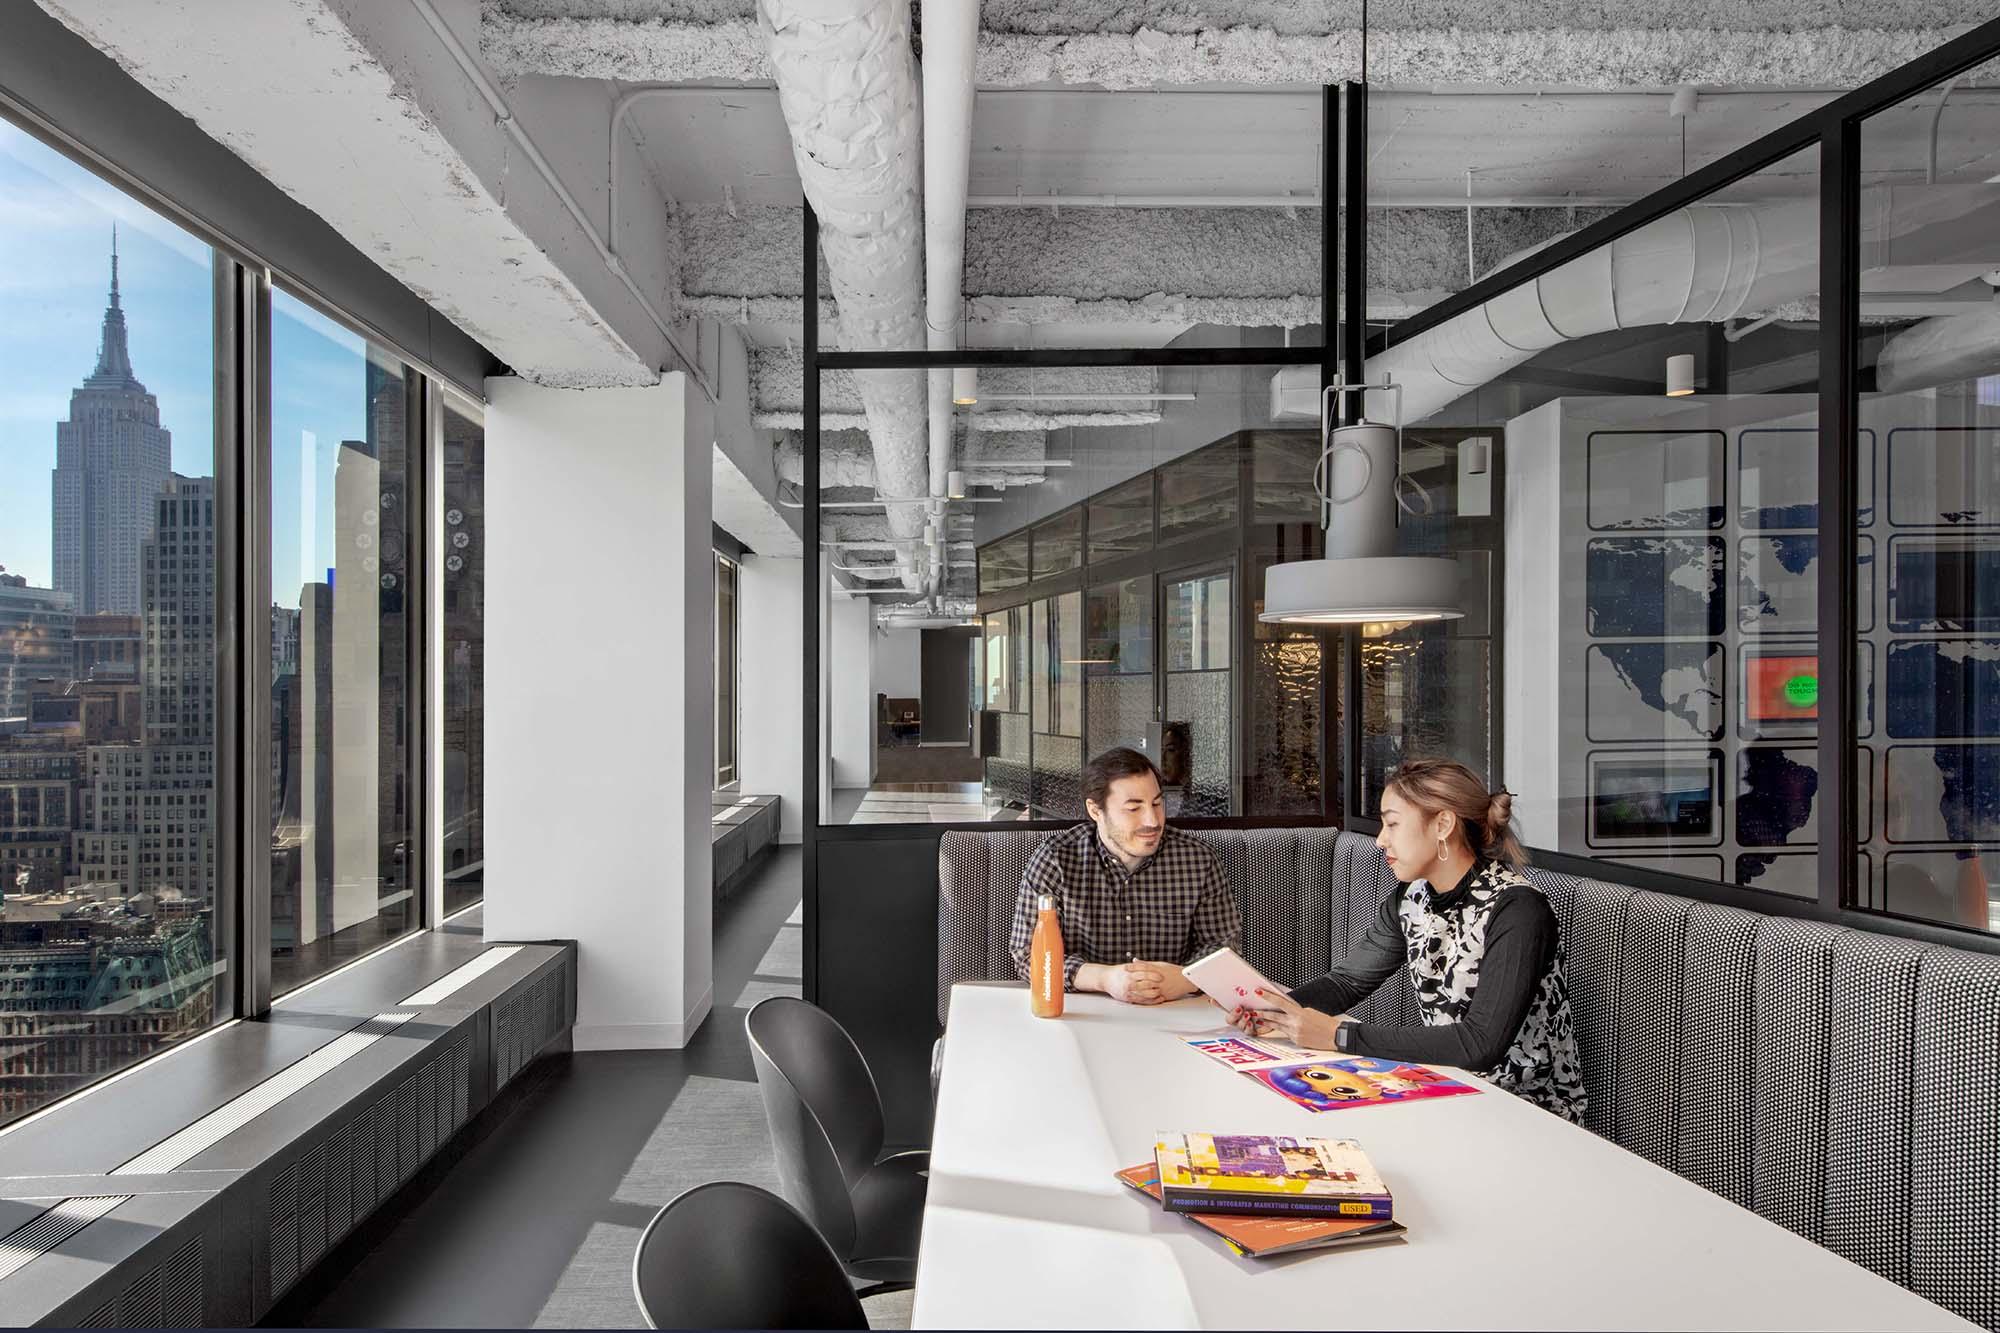 viacom_coolest_offices_2019_image_4.jpg